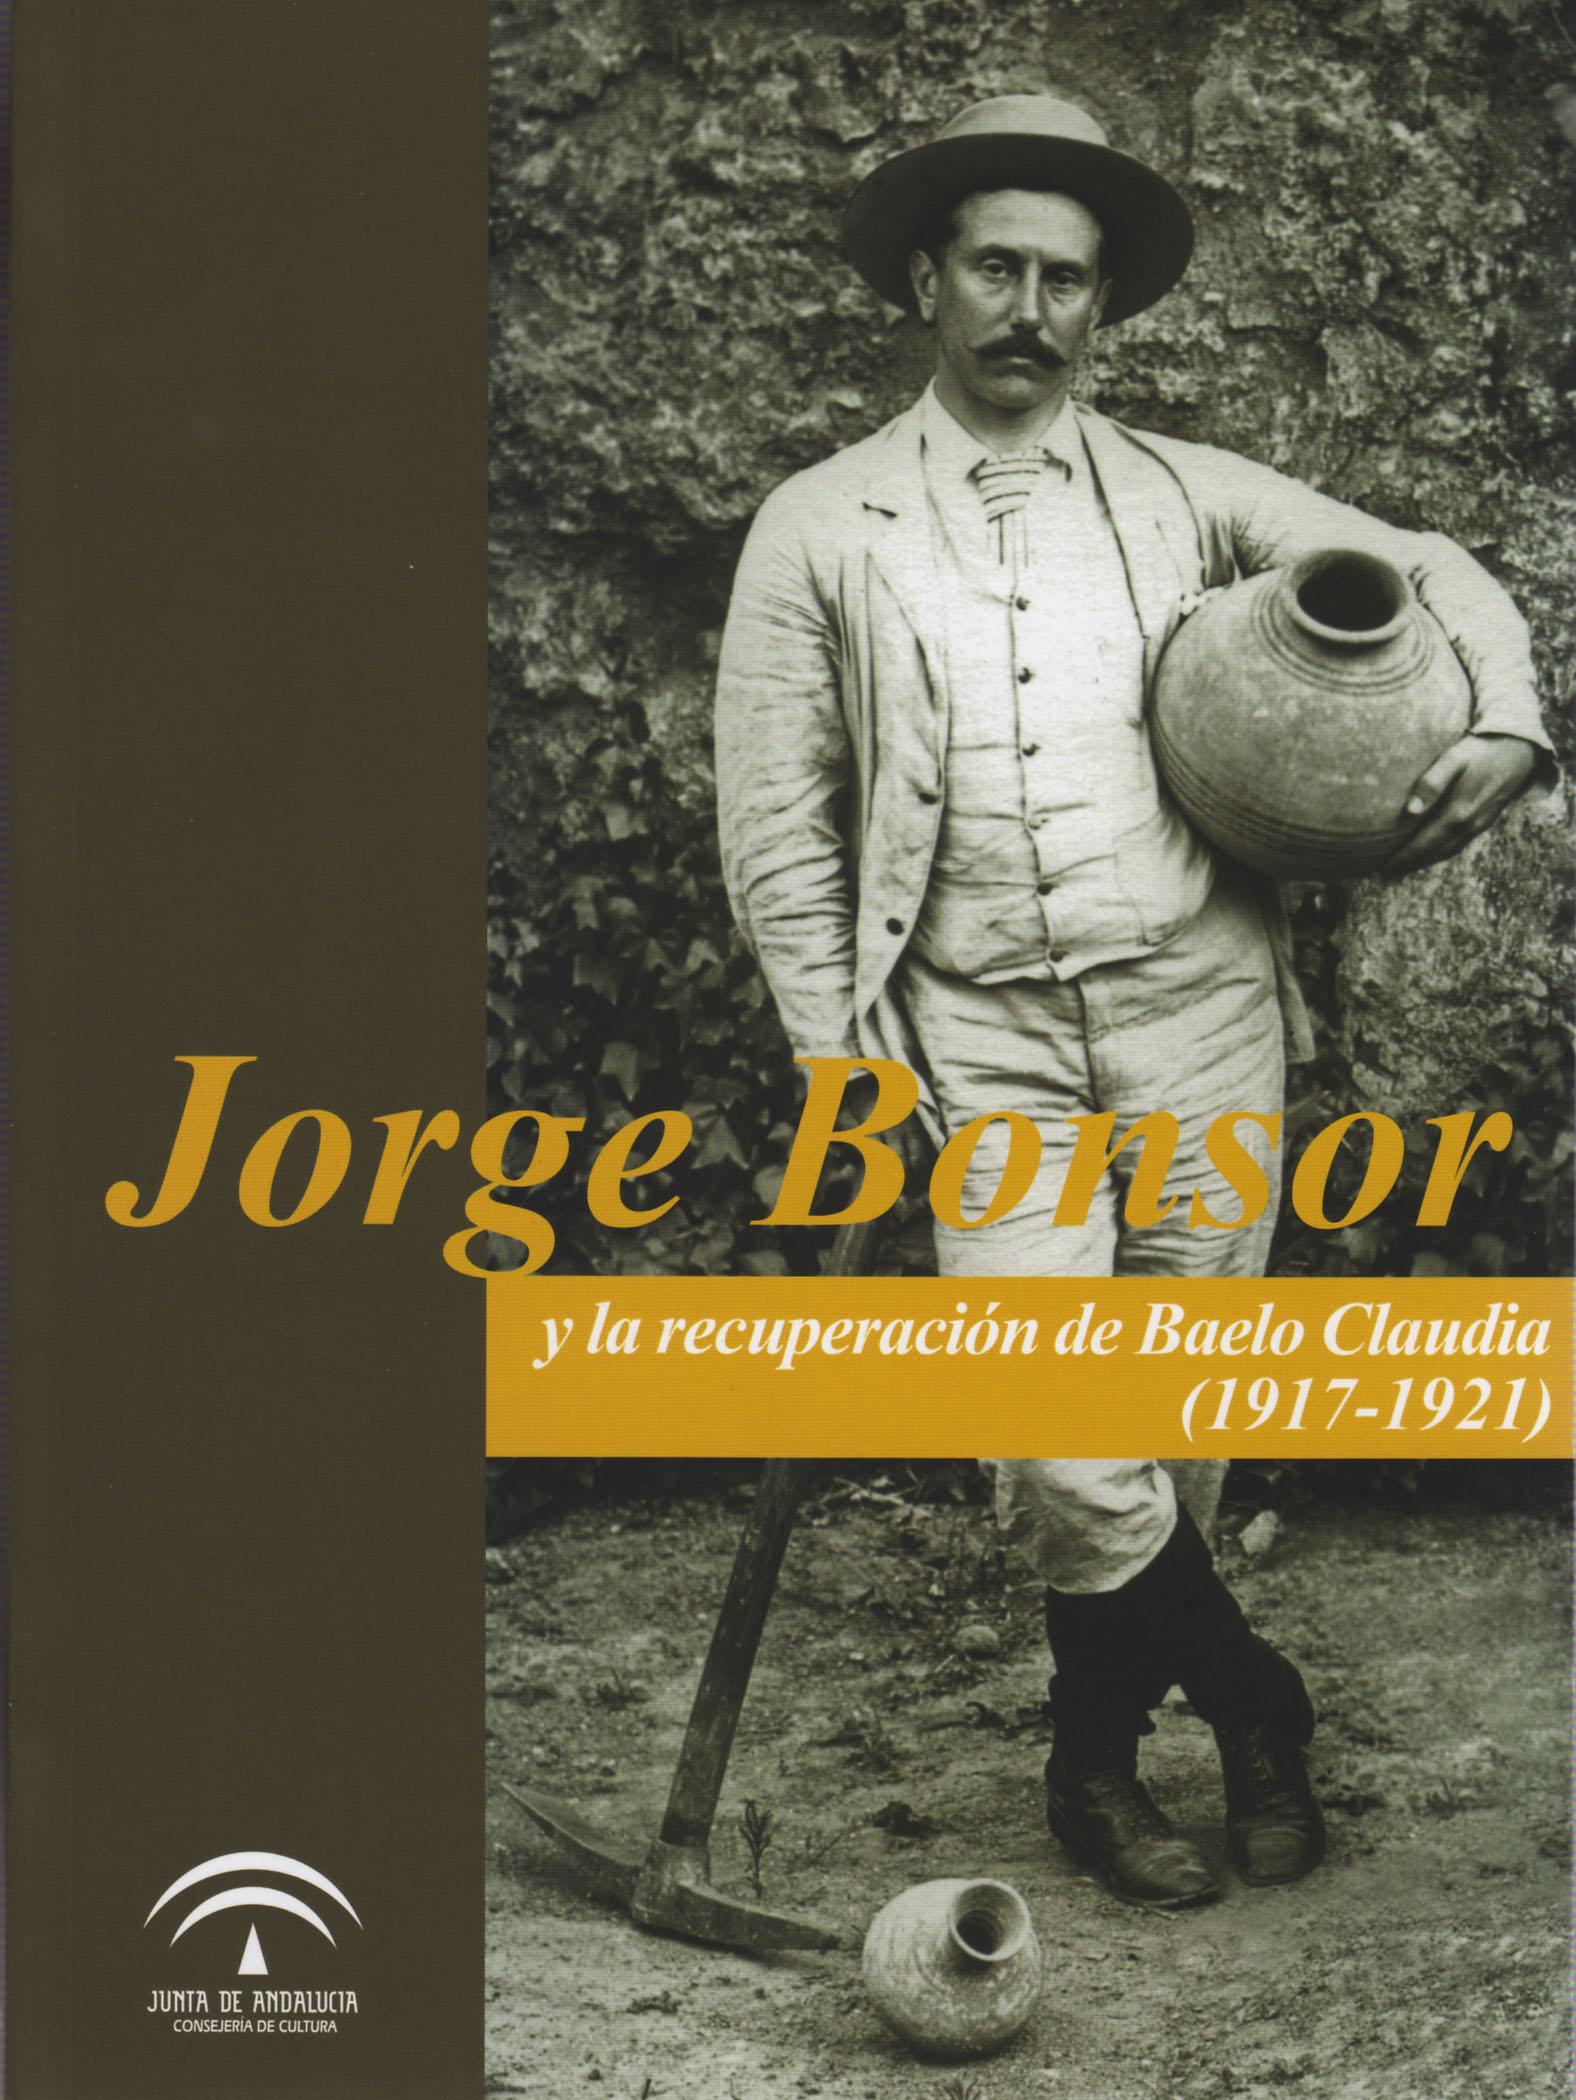 Jorge Bonsor